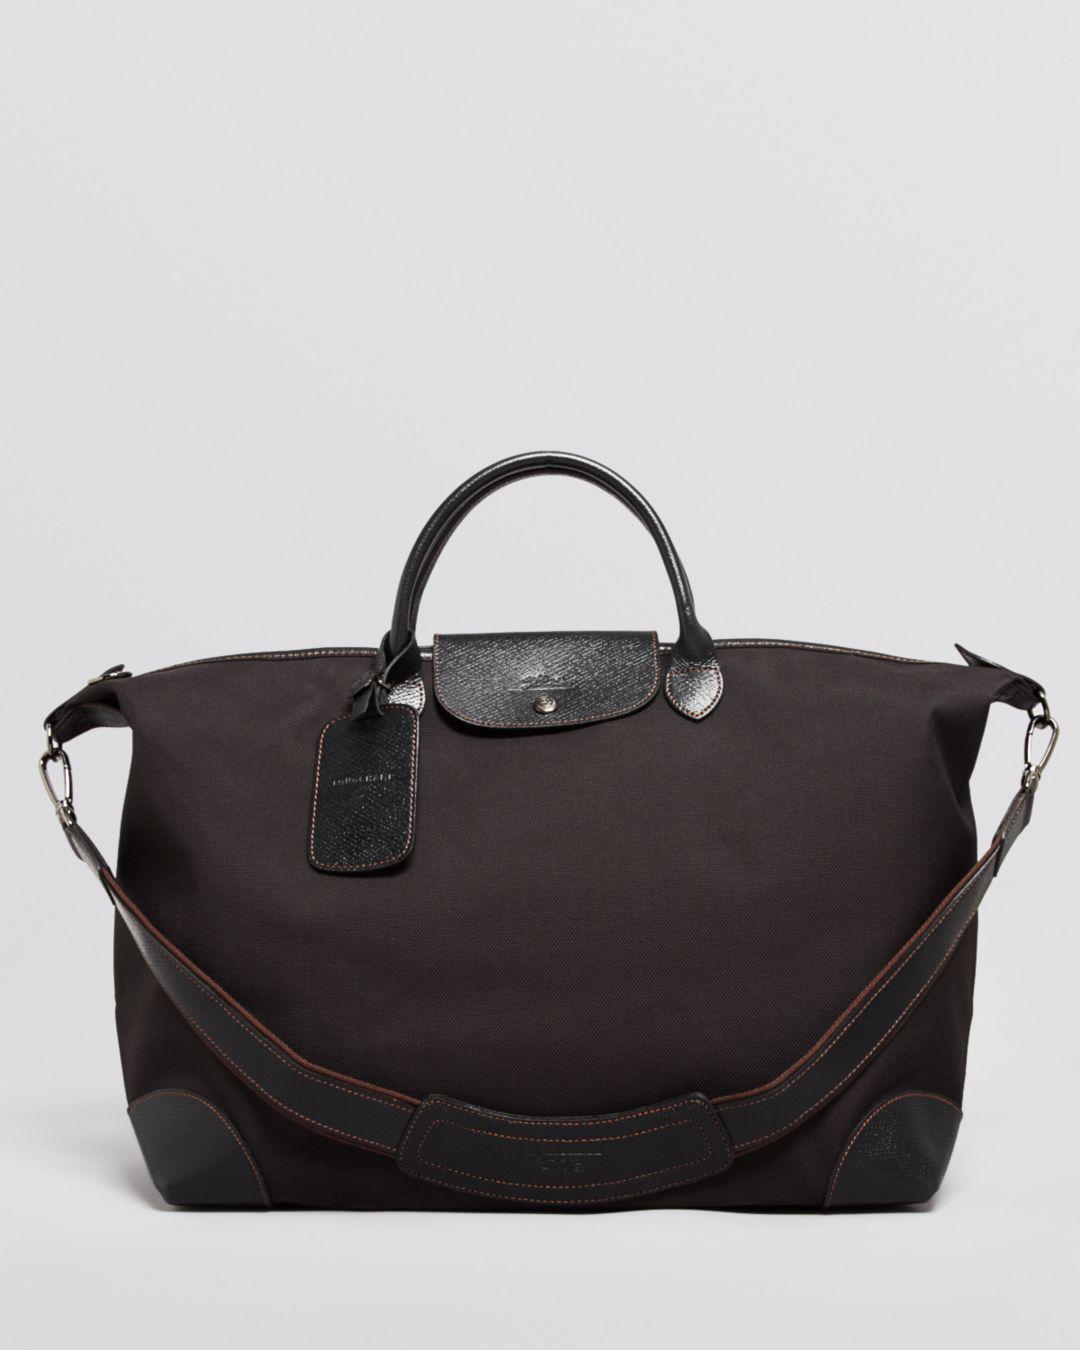 Lyst - Longchamp Boxford Large Duffel Bag in Black for Men 07a187fc8b